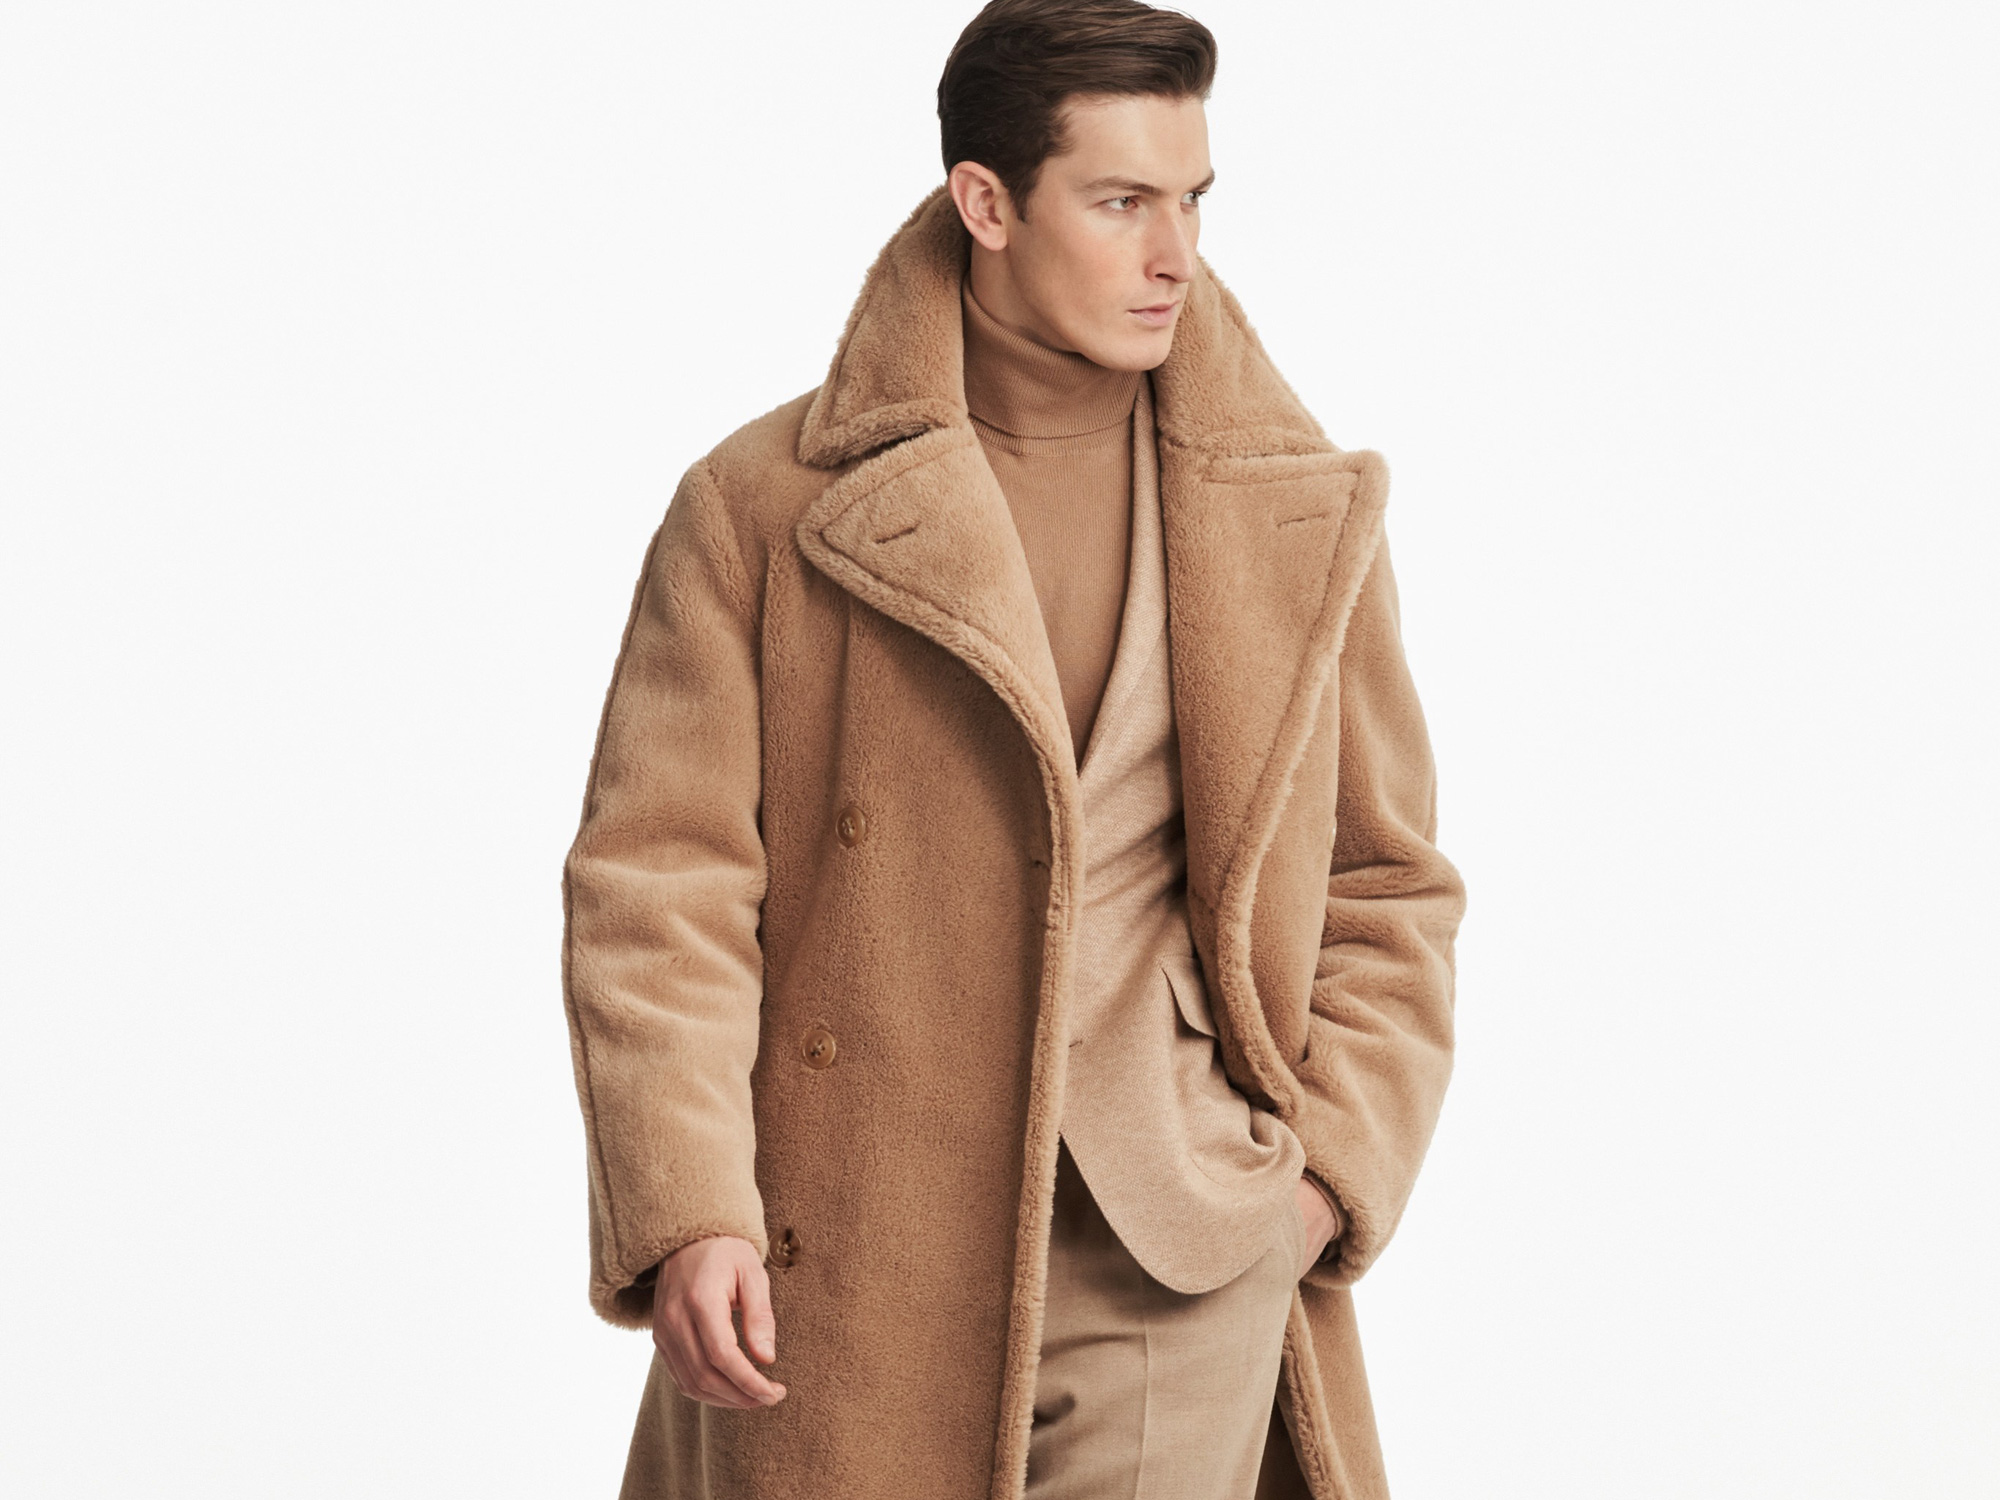 Polo Ralph Lauren Menswear- Fall 2019